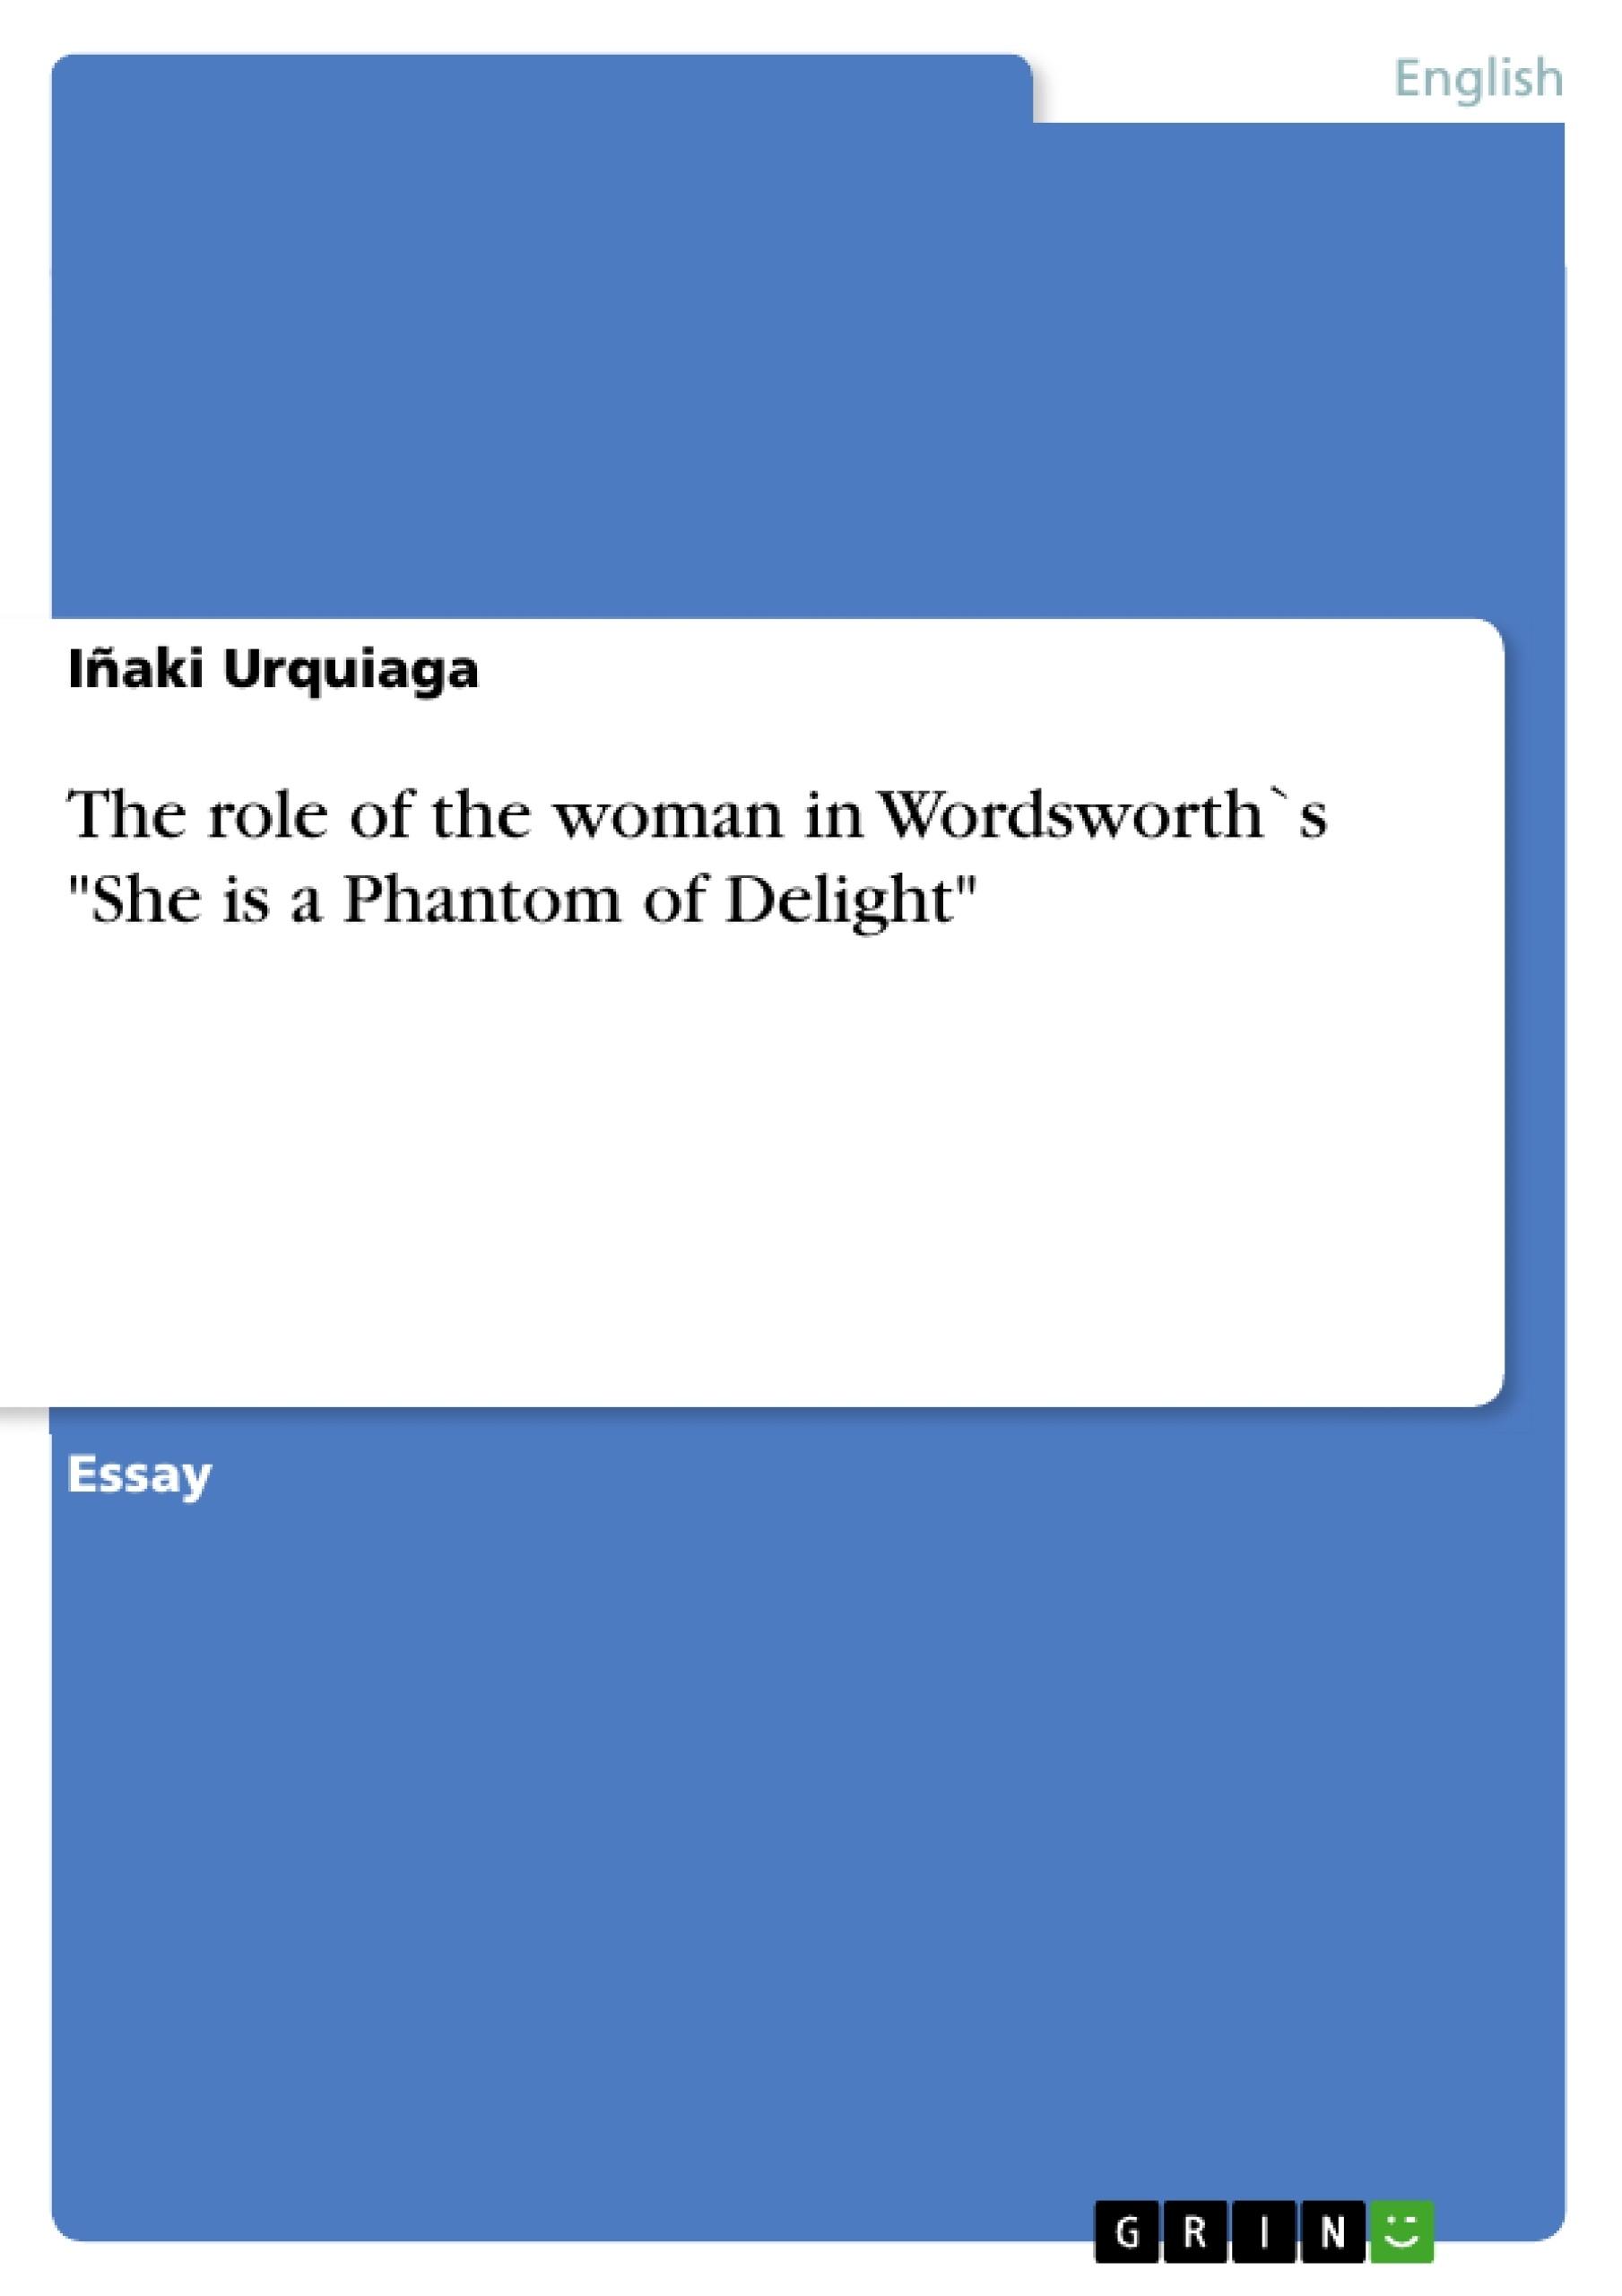 shakespeare sonnet 18 analysis essay pdf